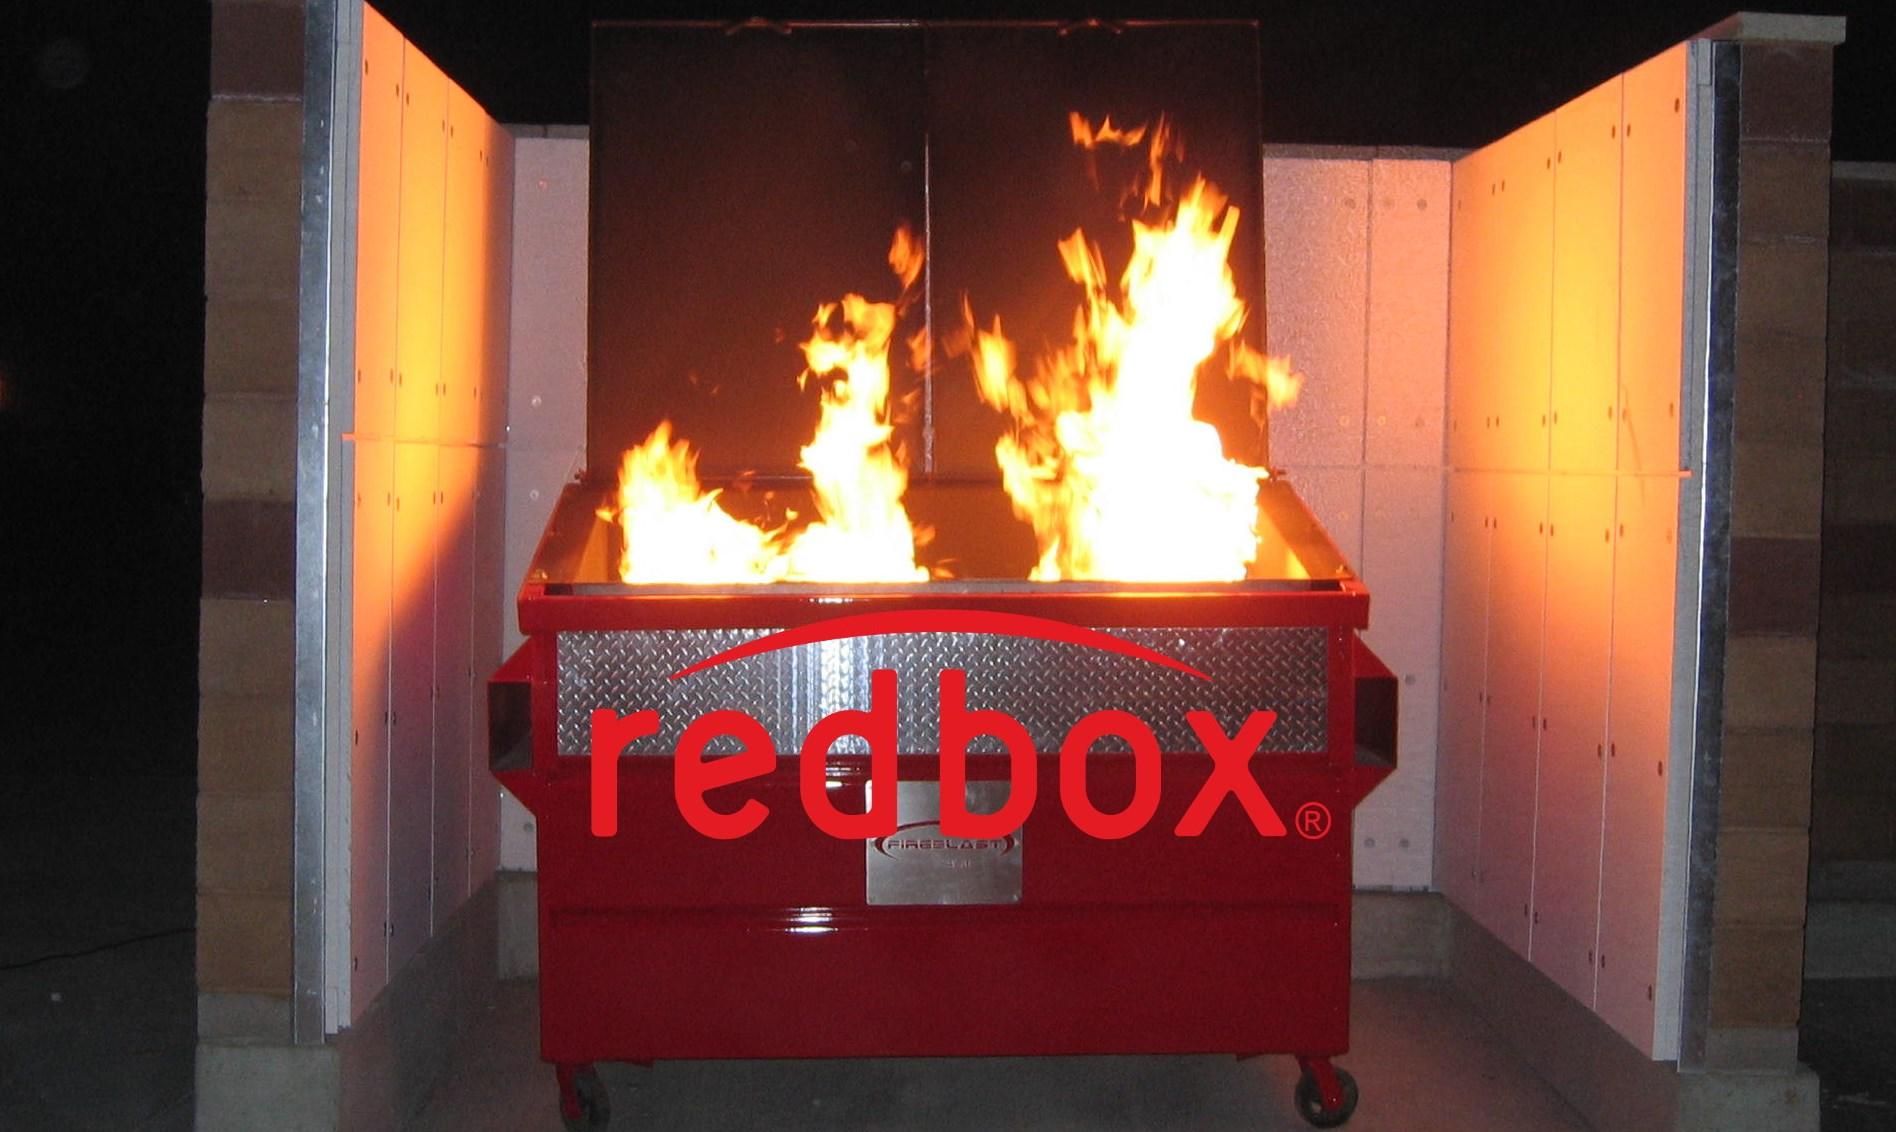 Redbox is going to start renting 4K Ultra HD blu-rays screenshot